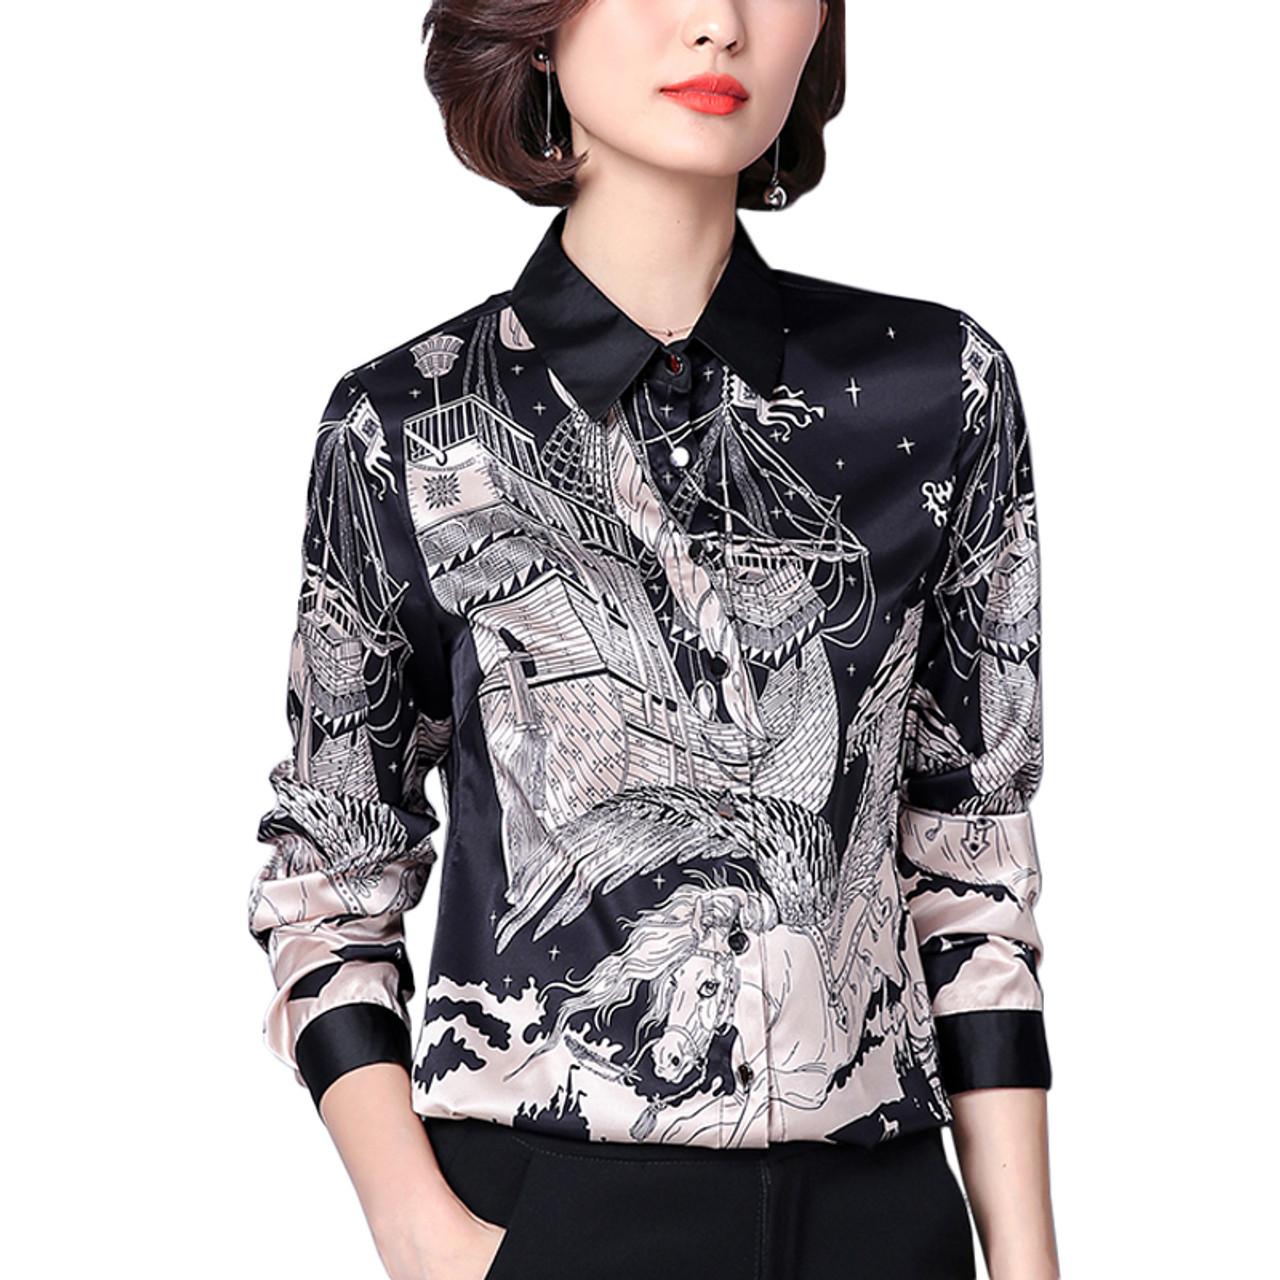 d7018fa69dd1c New Arrival 2018 Spring Female Imitation Silk Satin Blouse Slim Women s  Printing Shirt Long Sleeve Plus ...